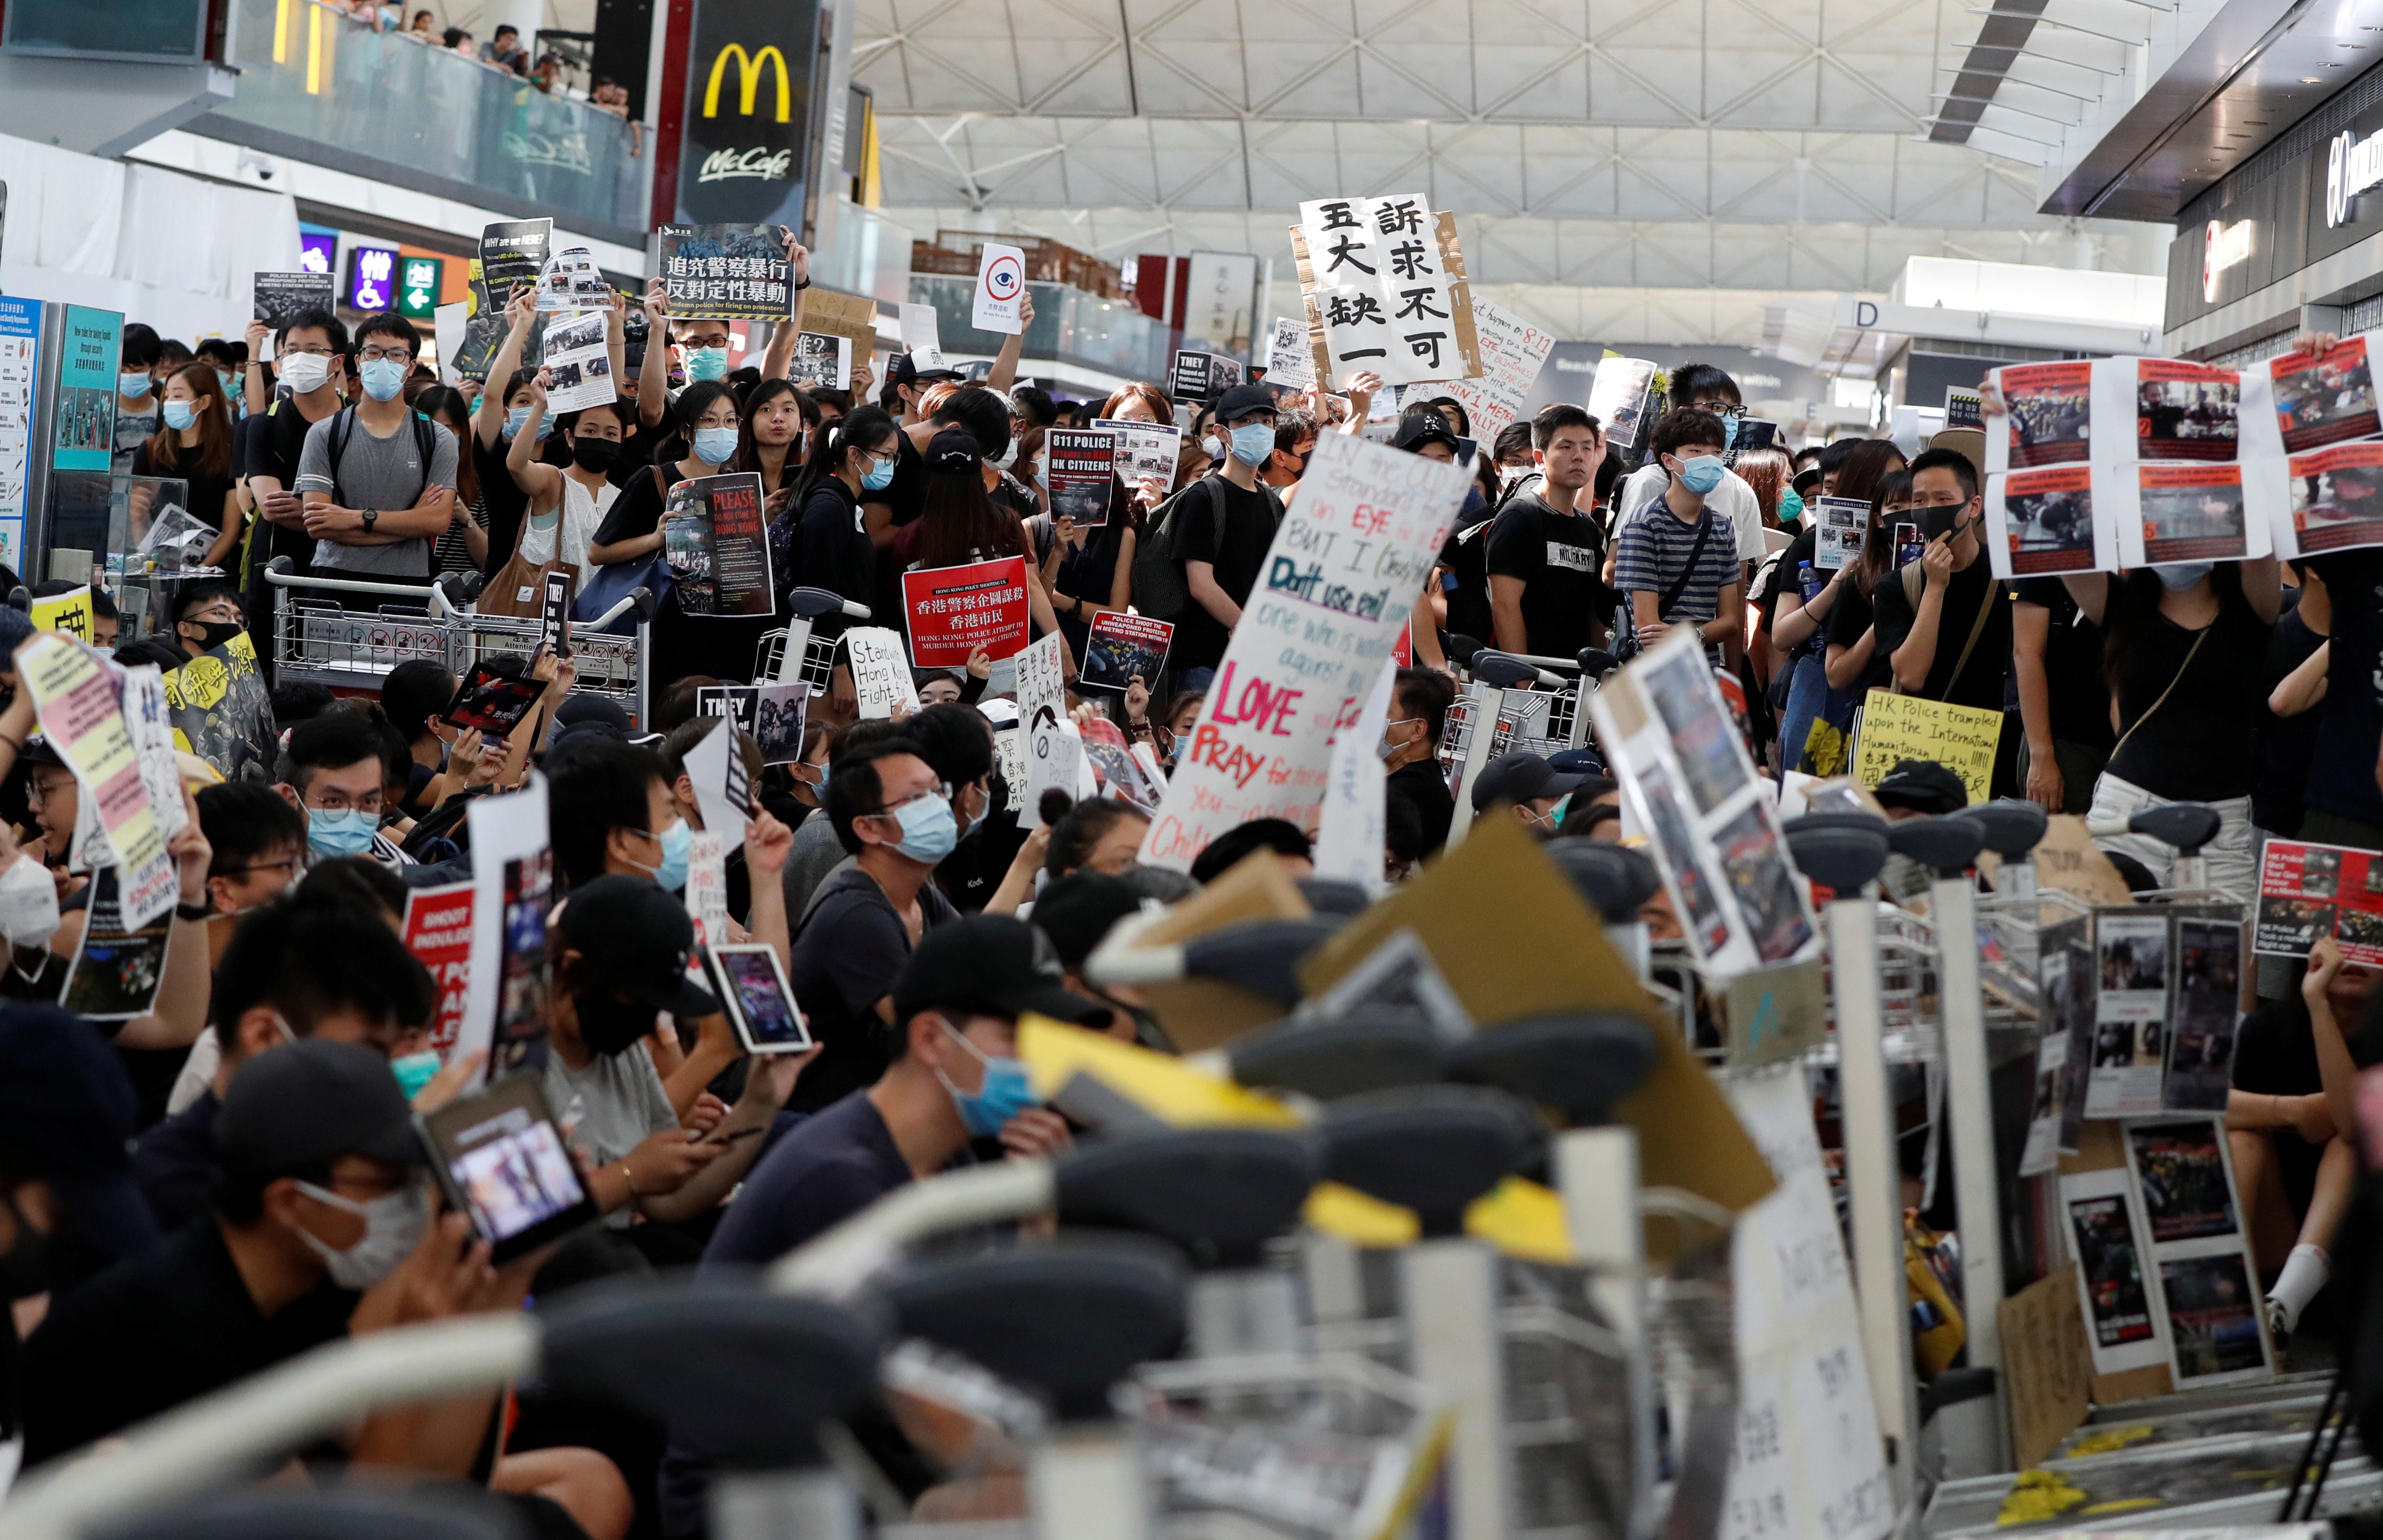 20190911 2019-08-13T071706Z_1594351791_RC15E9A929D0_RTRMADP_3_HONGKONG-PROTESTS.JPG